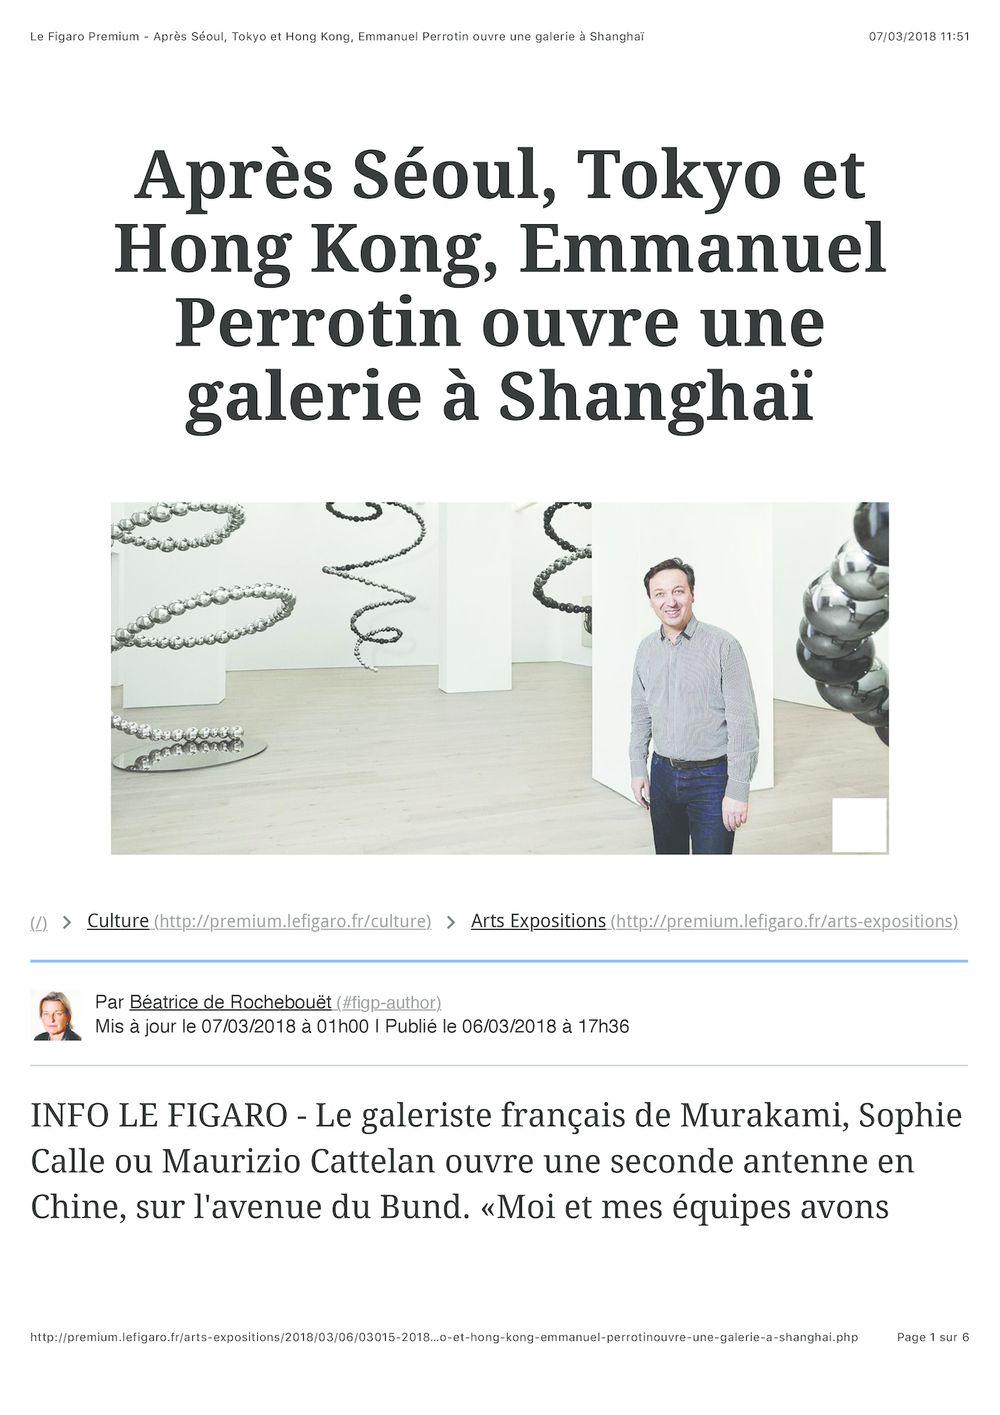 Le Figaro | Emmanuel Perrotin